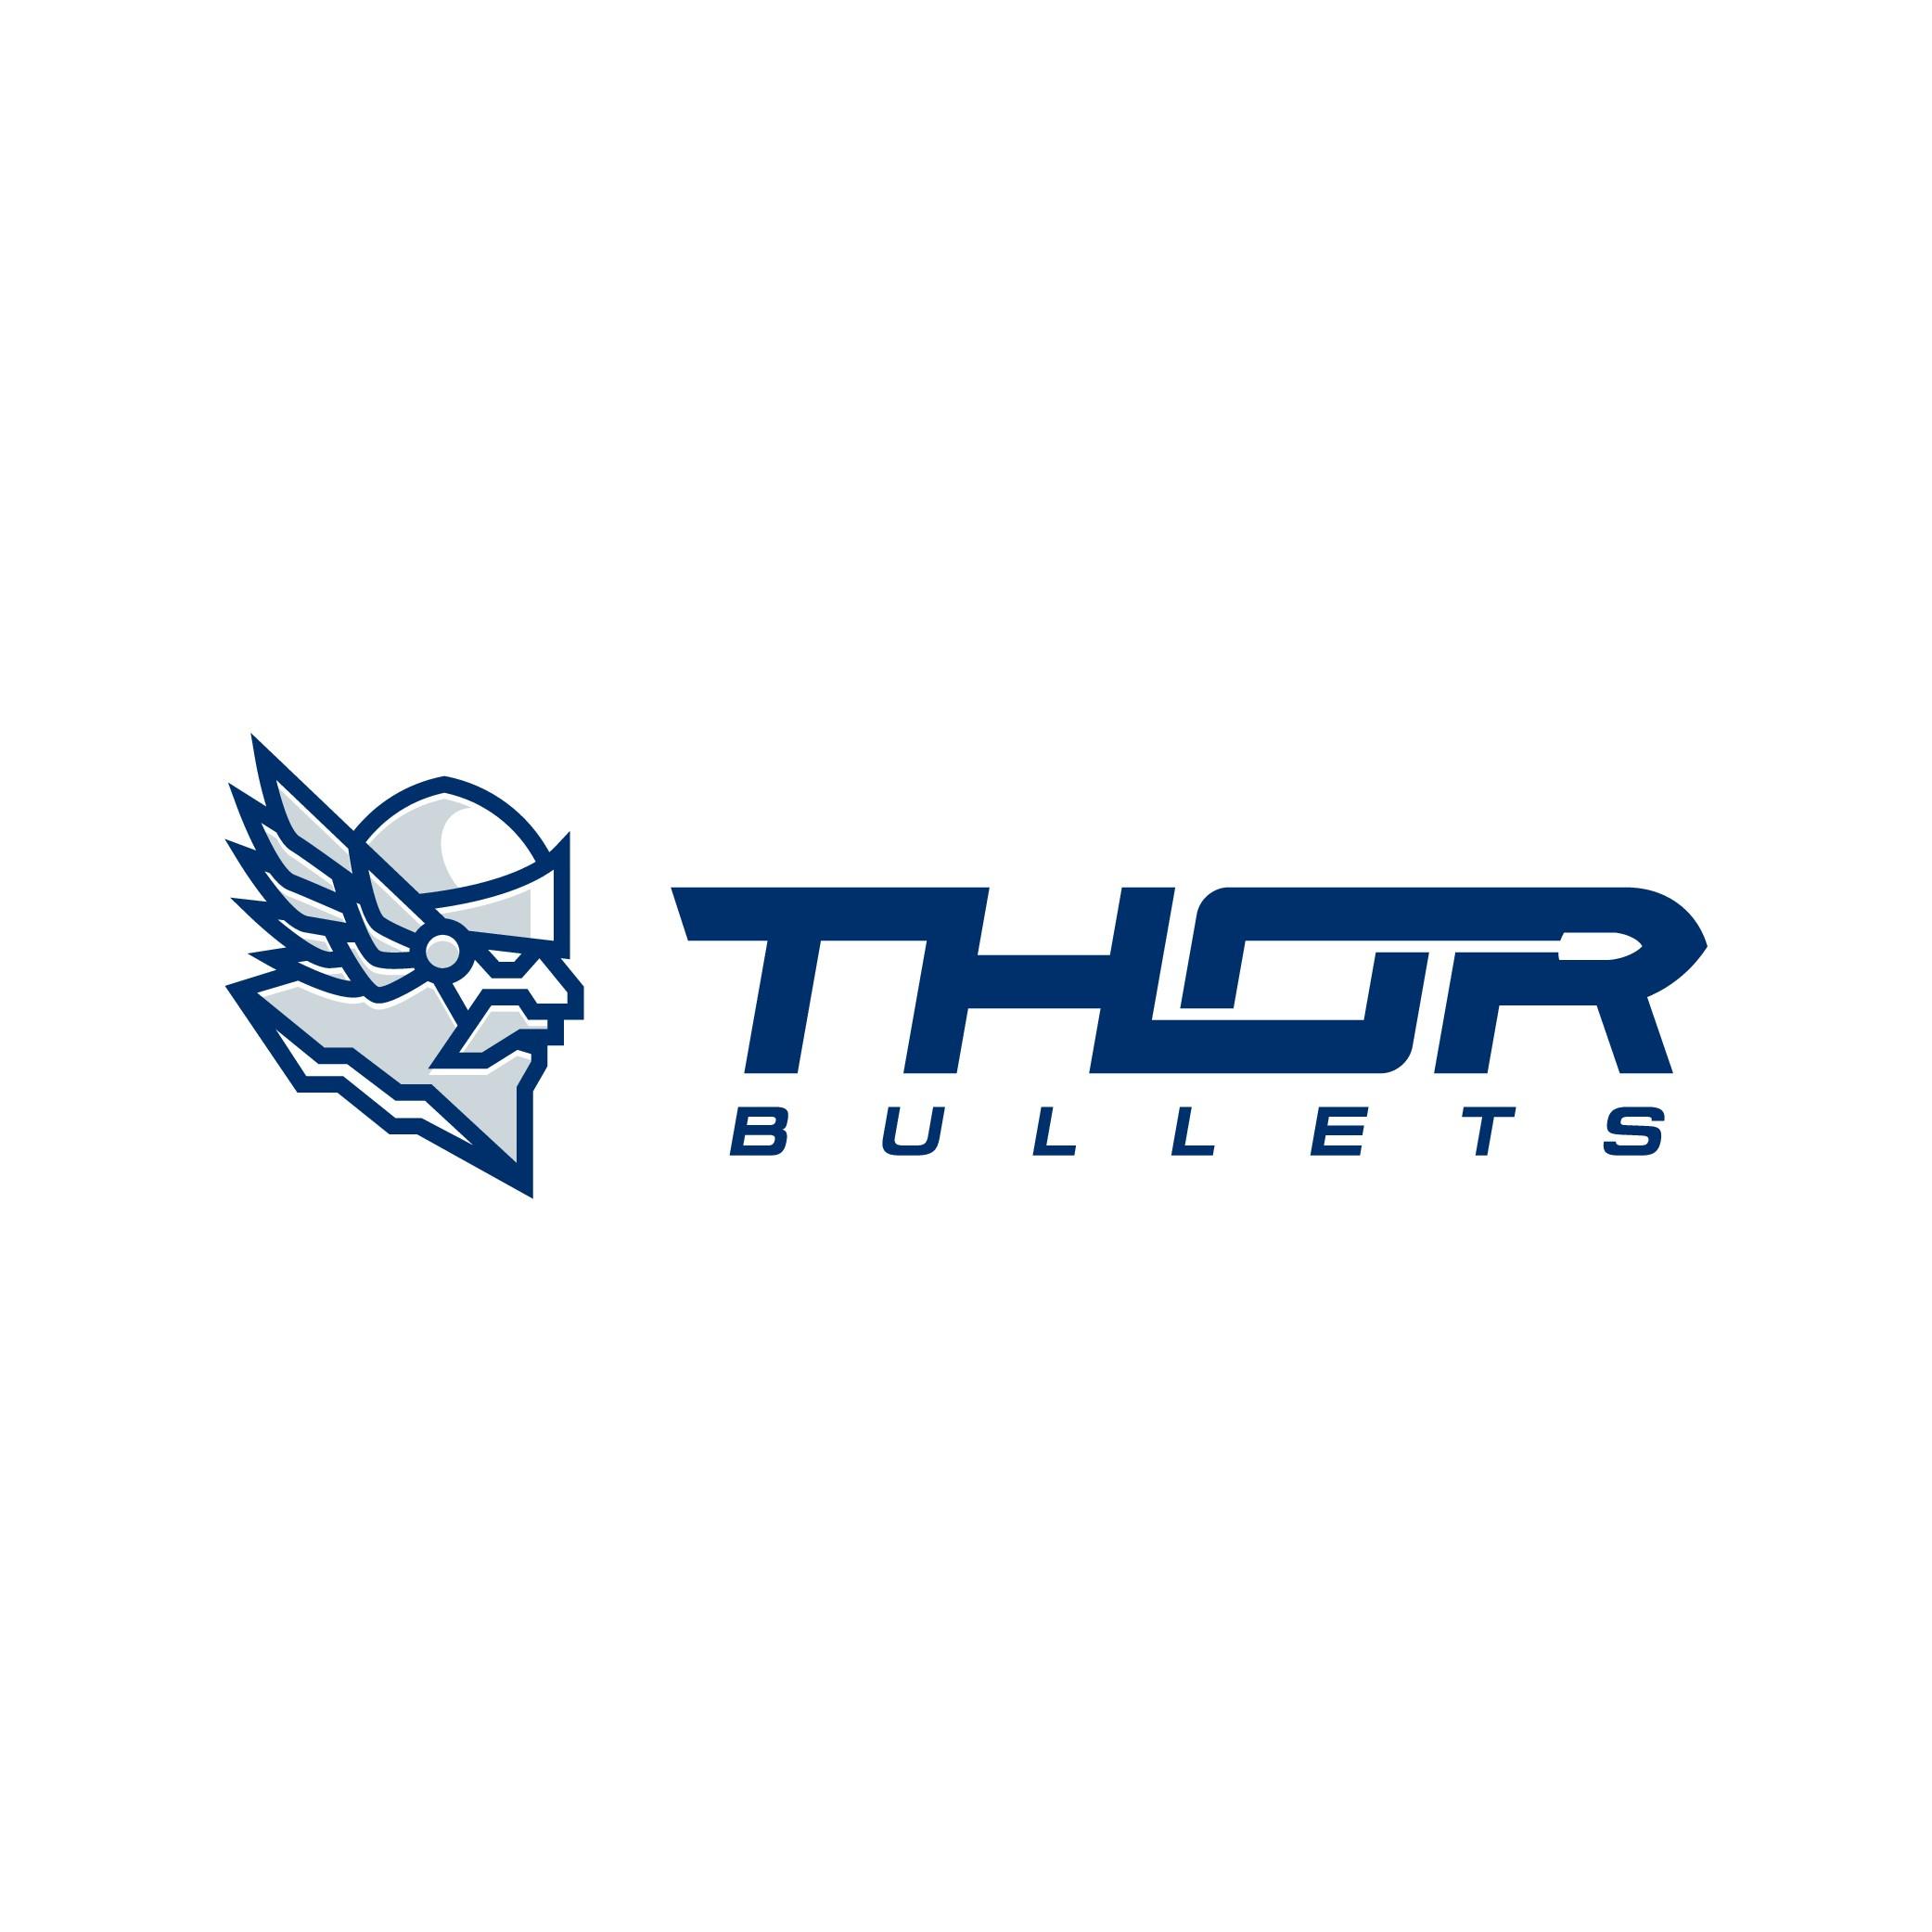 Thor Bullets